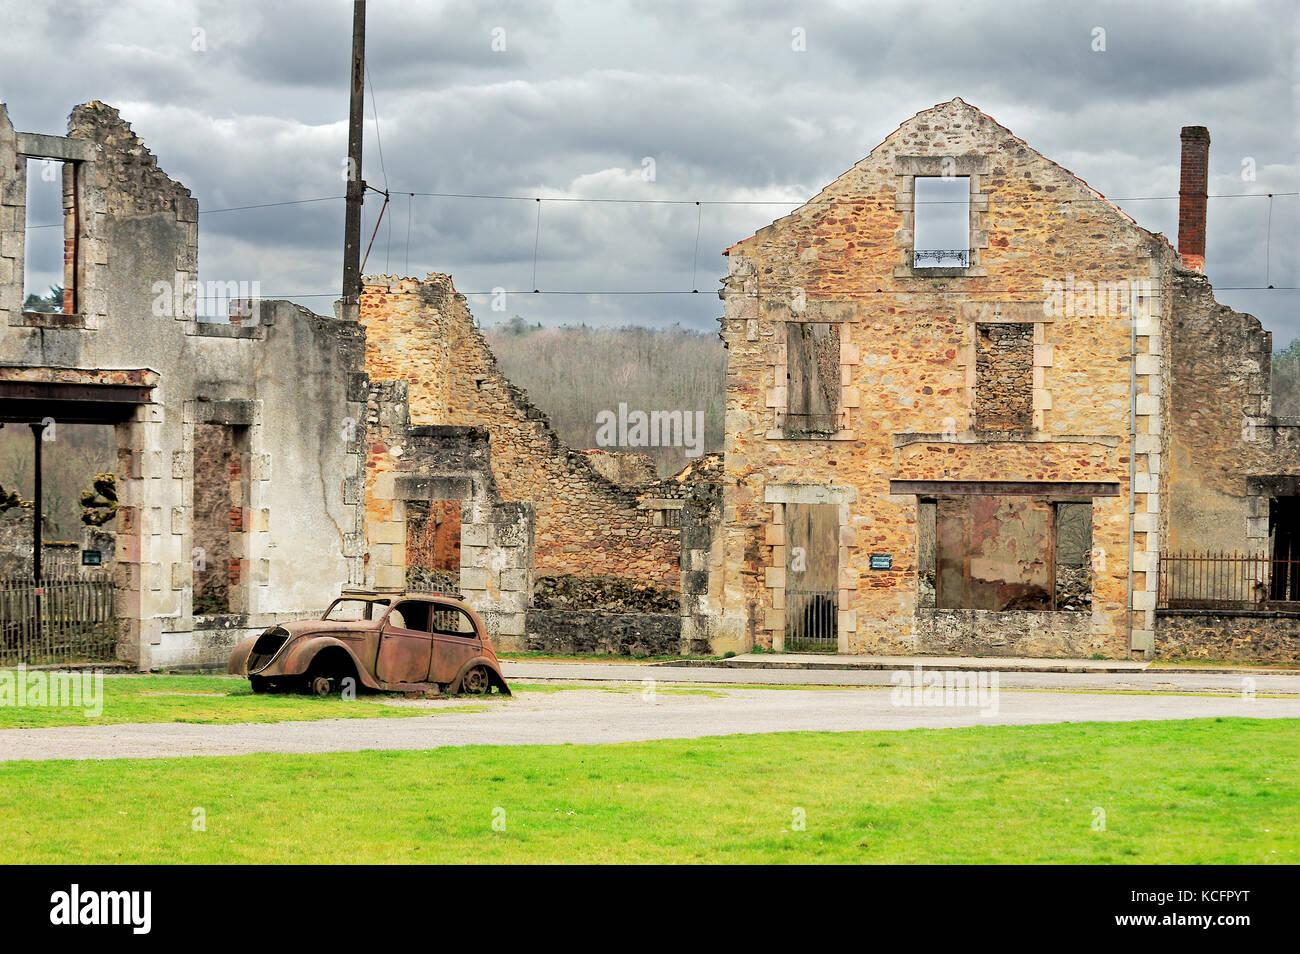 building ruins and remains of Peugeot 202 car, Oradour-sur-Glane, Haute-Vienne Department, Limousin, France - Stock Image